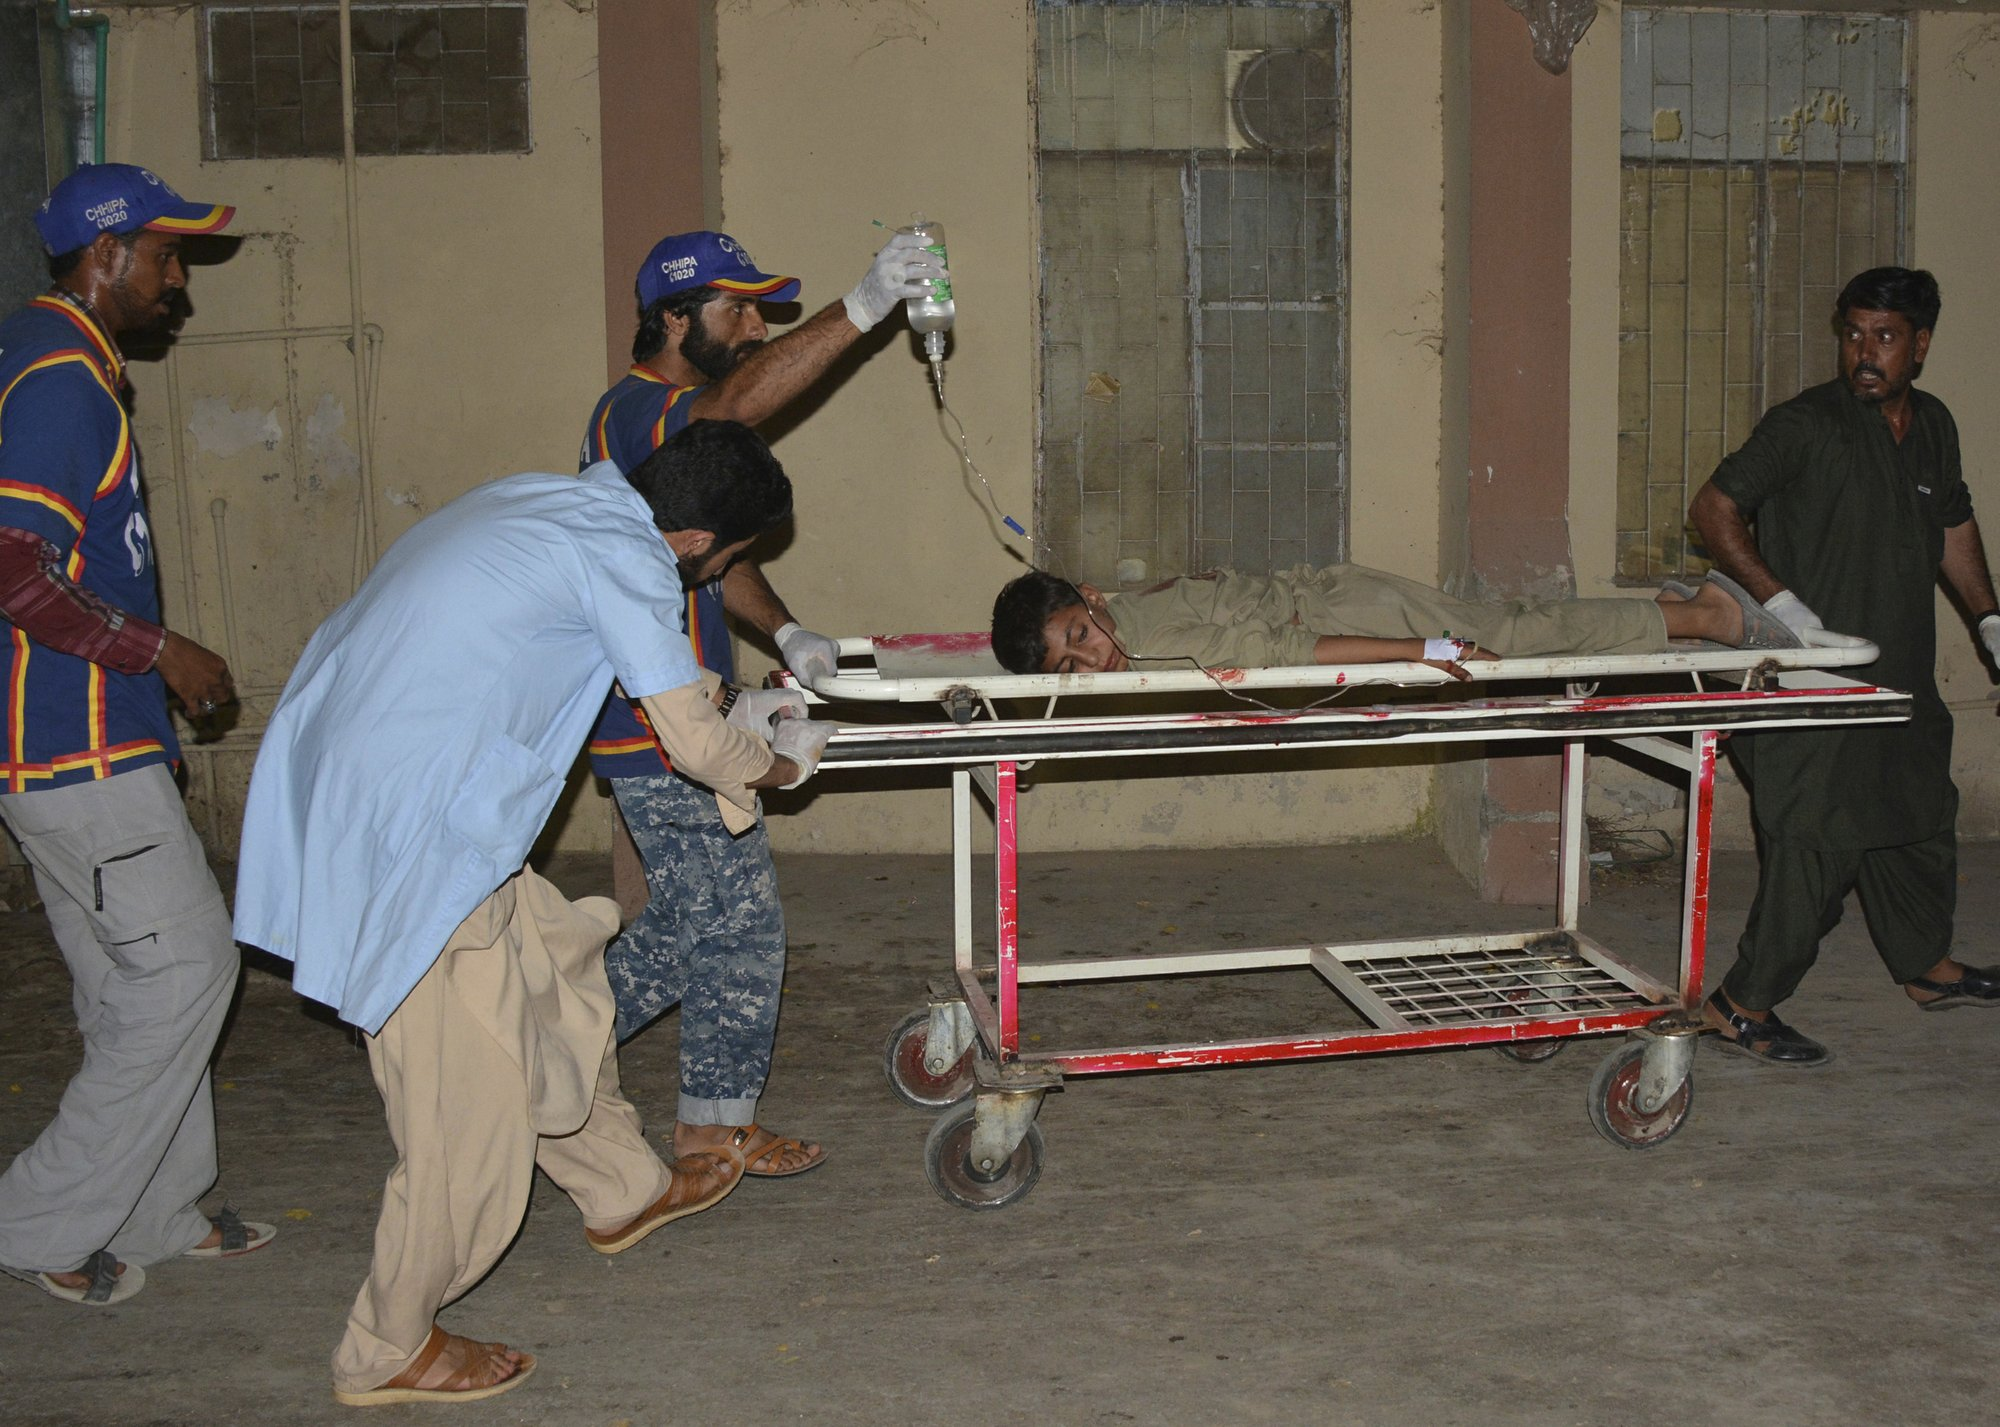 Market bombing in Pakistan kills 2, wounds 29